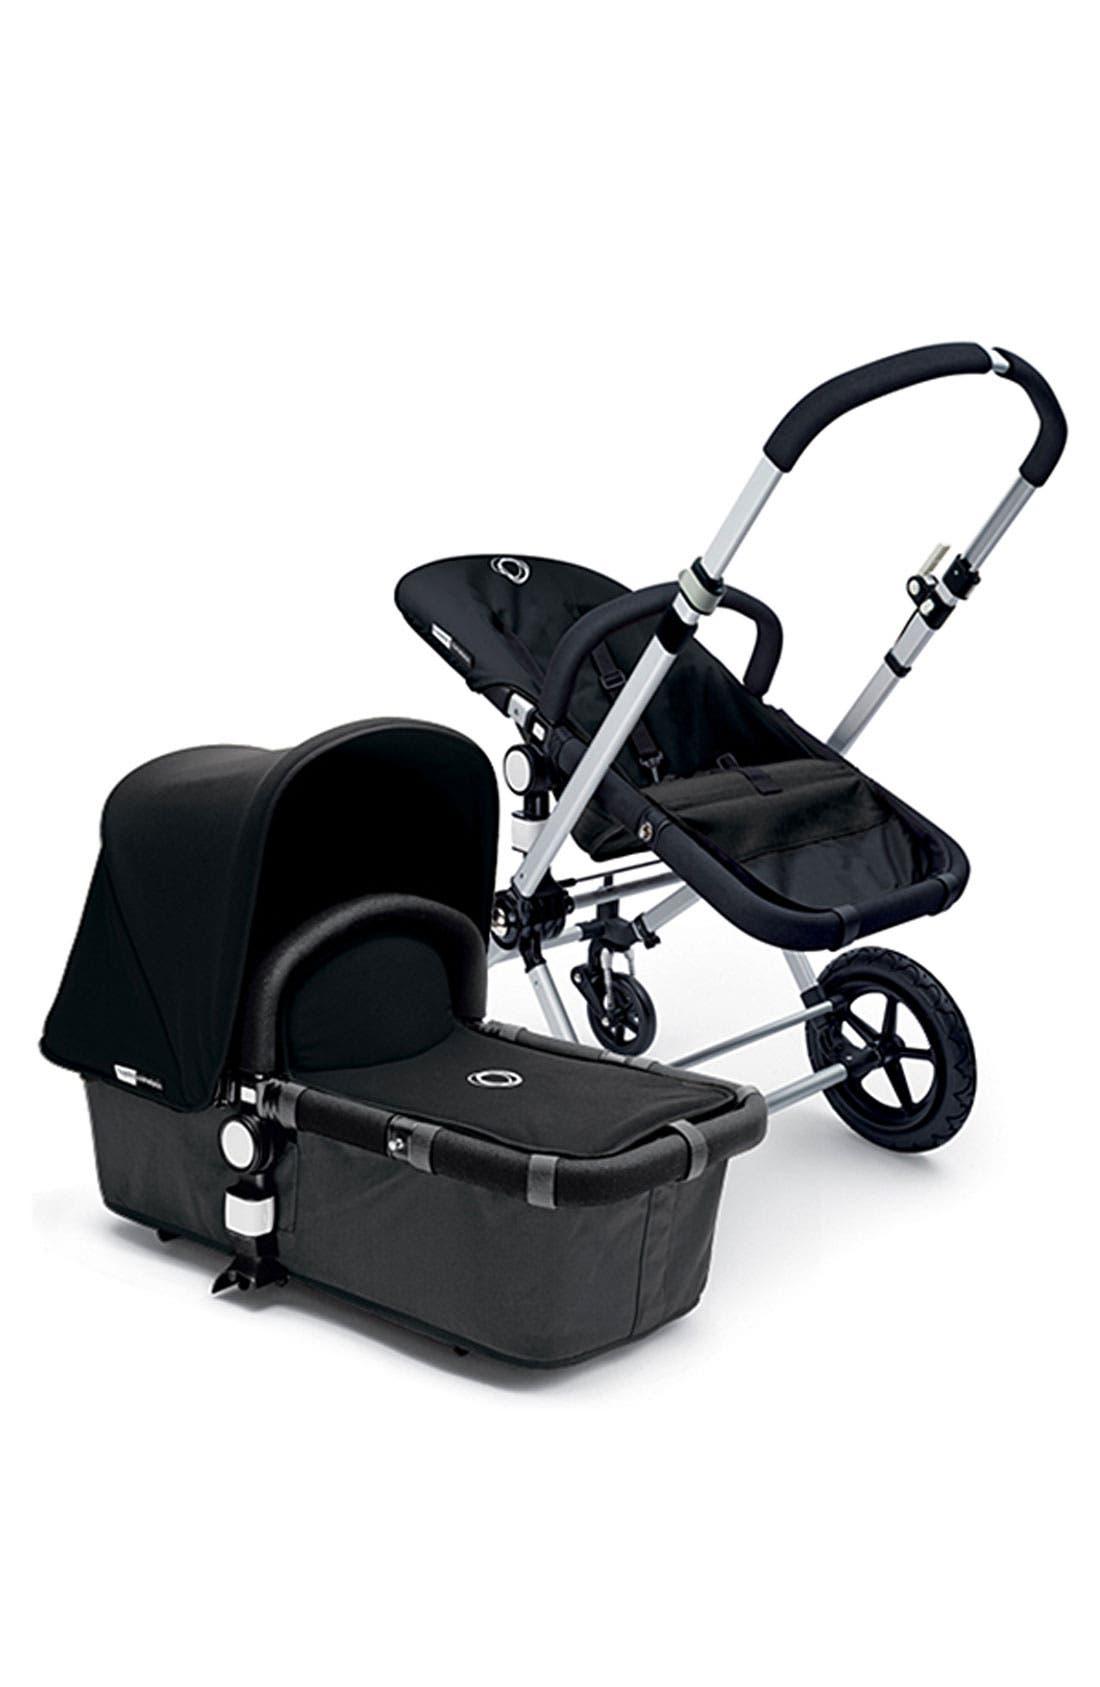 Main Image - Bugaboo 'Cameleon' Stroller (Shown with Dark Grey Canvas)